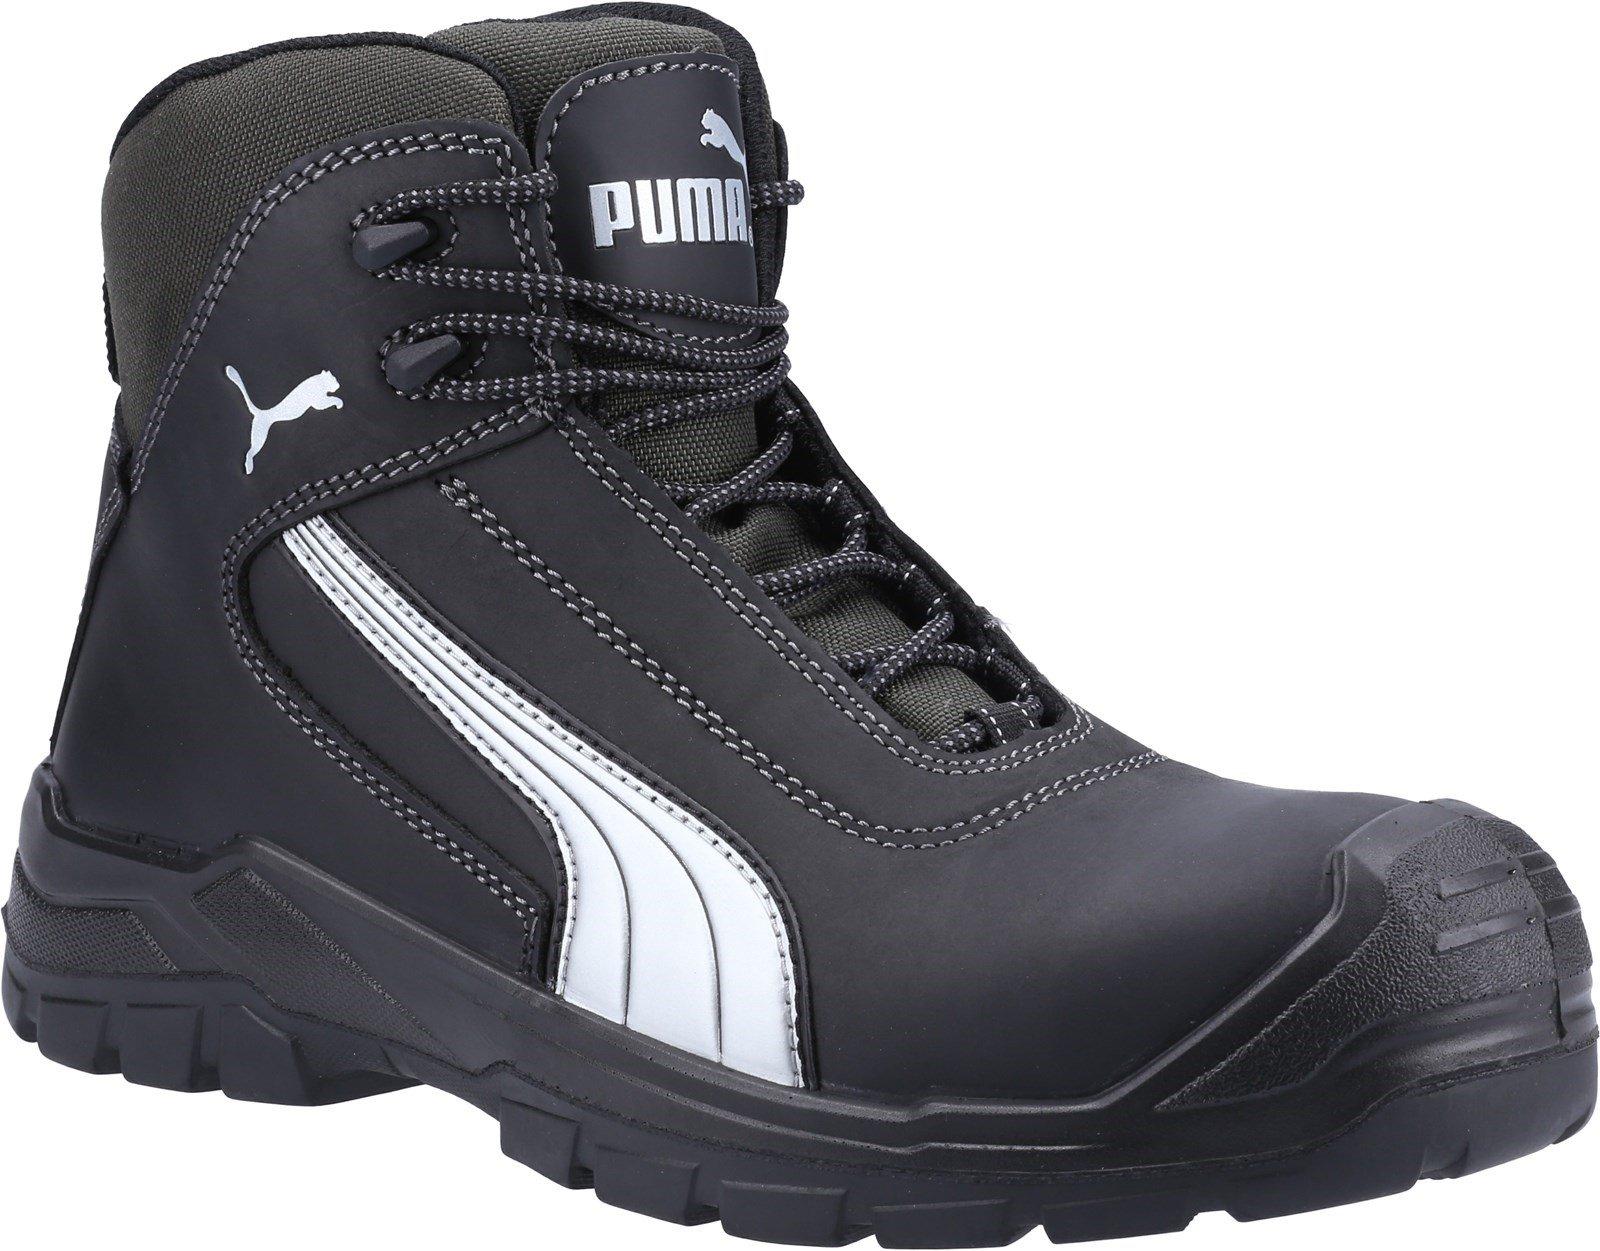 Puma Safety Unisex Cascades Mid S3 Safety Boot Black 23083 - Black 6